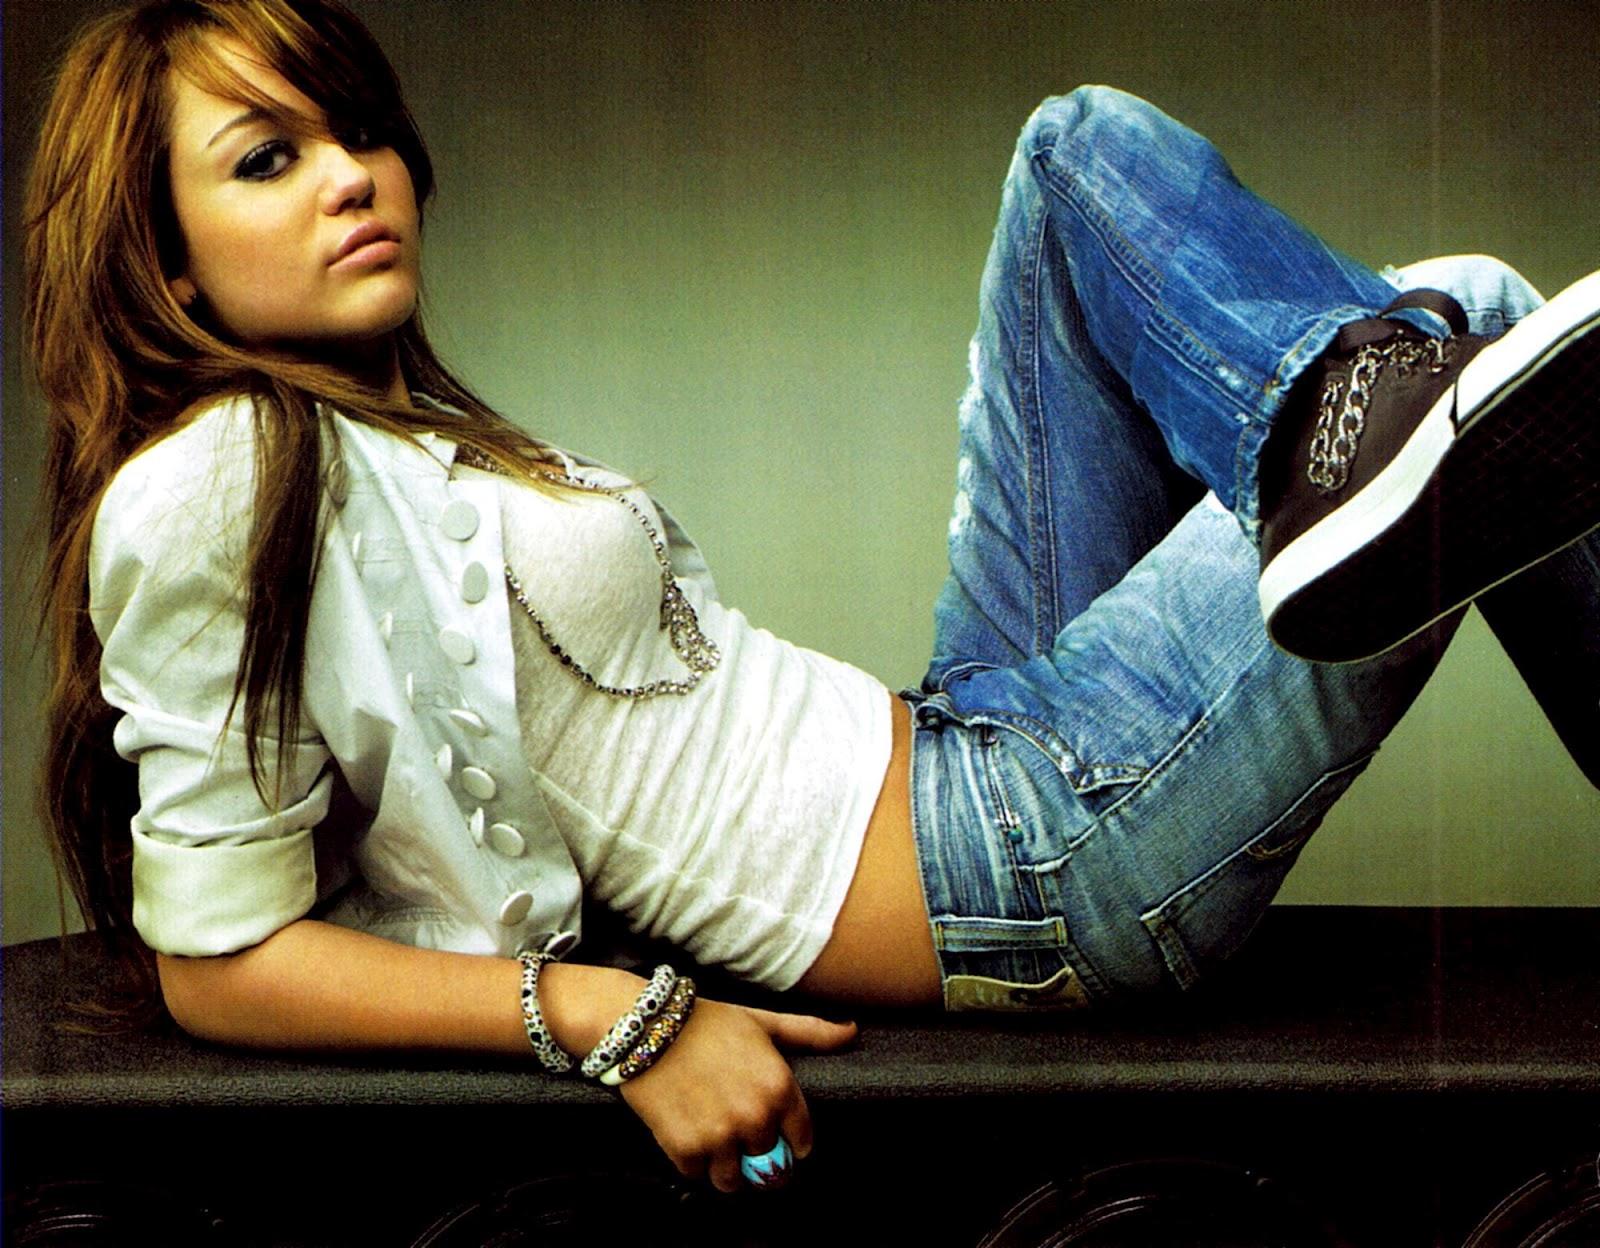 http://2.bp.blogspot.com/-AsXCTtji-ak/T4dcDPhuaII/AAAAAAAAGHg/bo1R94l6fqc/s1600/Miley-Cyrus-style.jpg